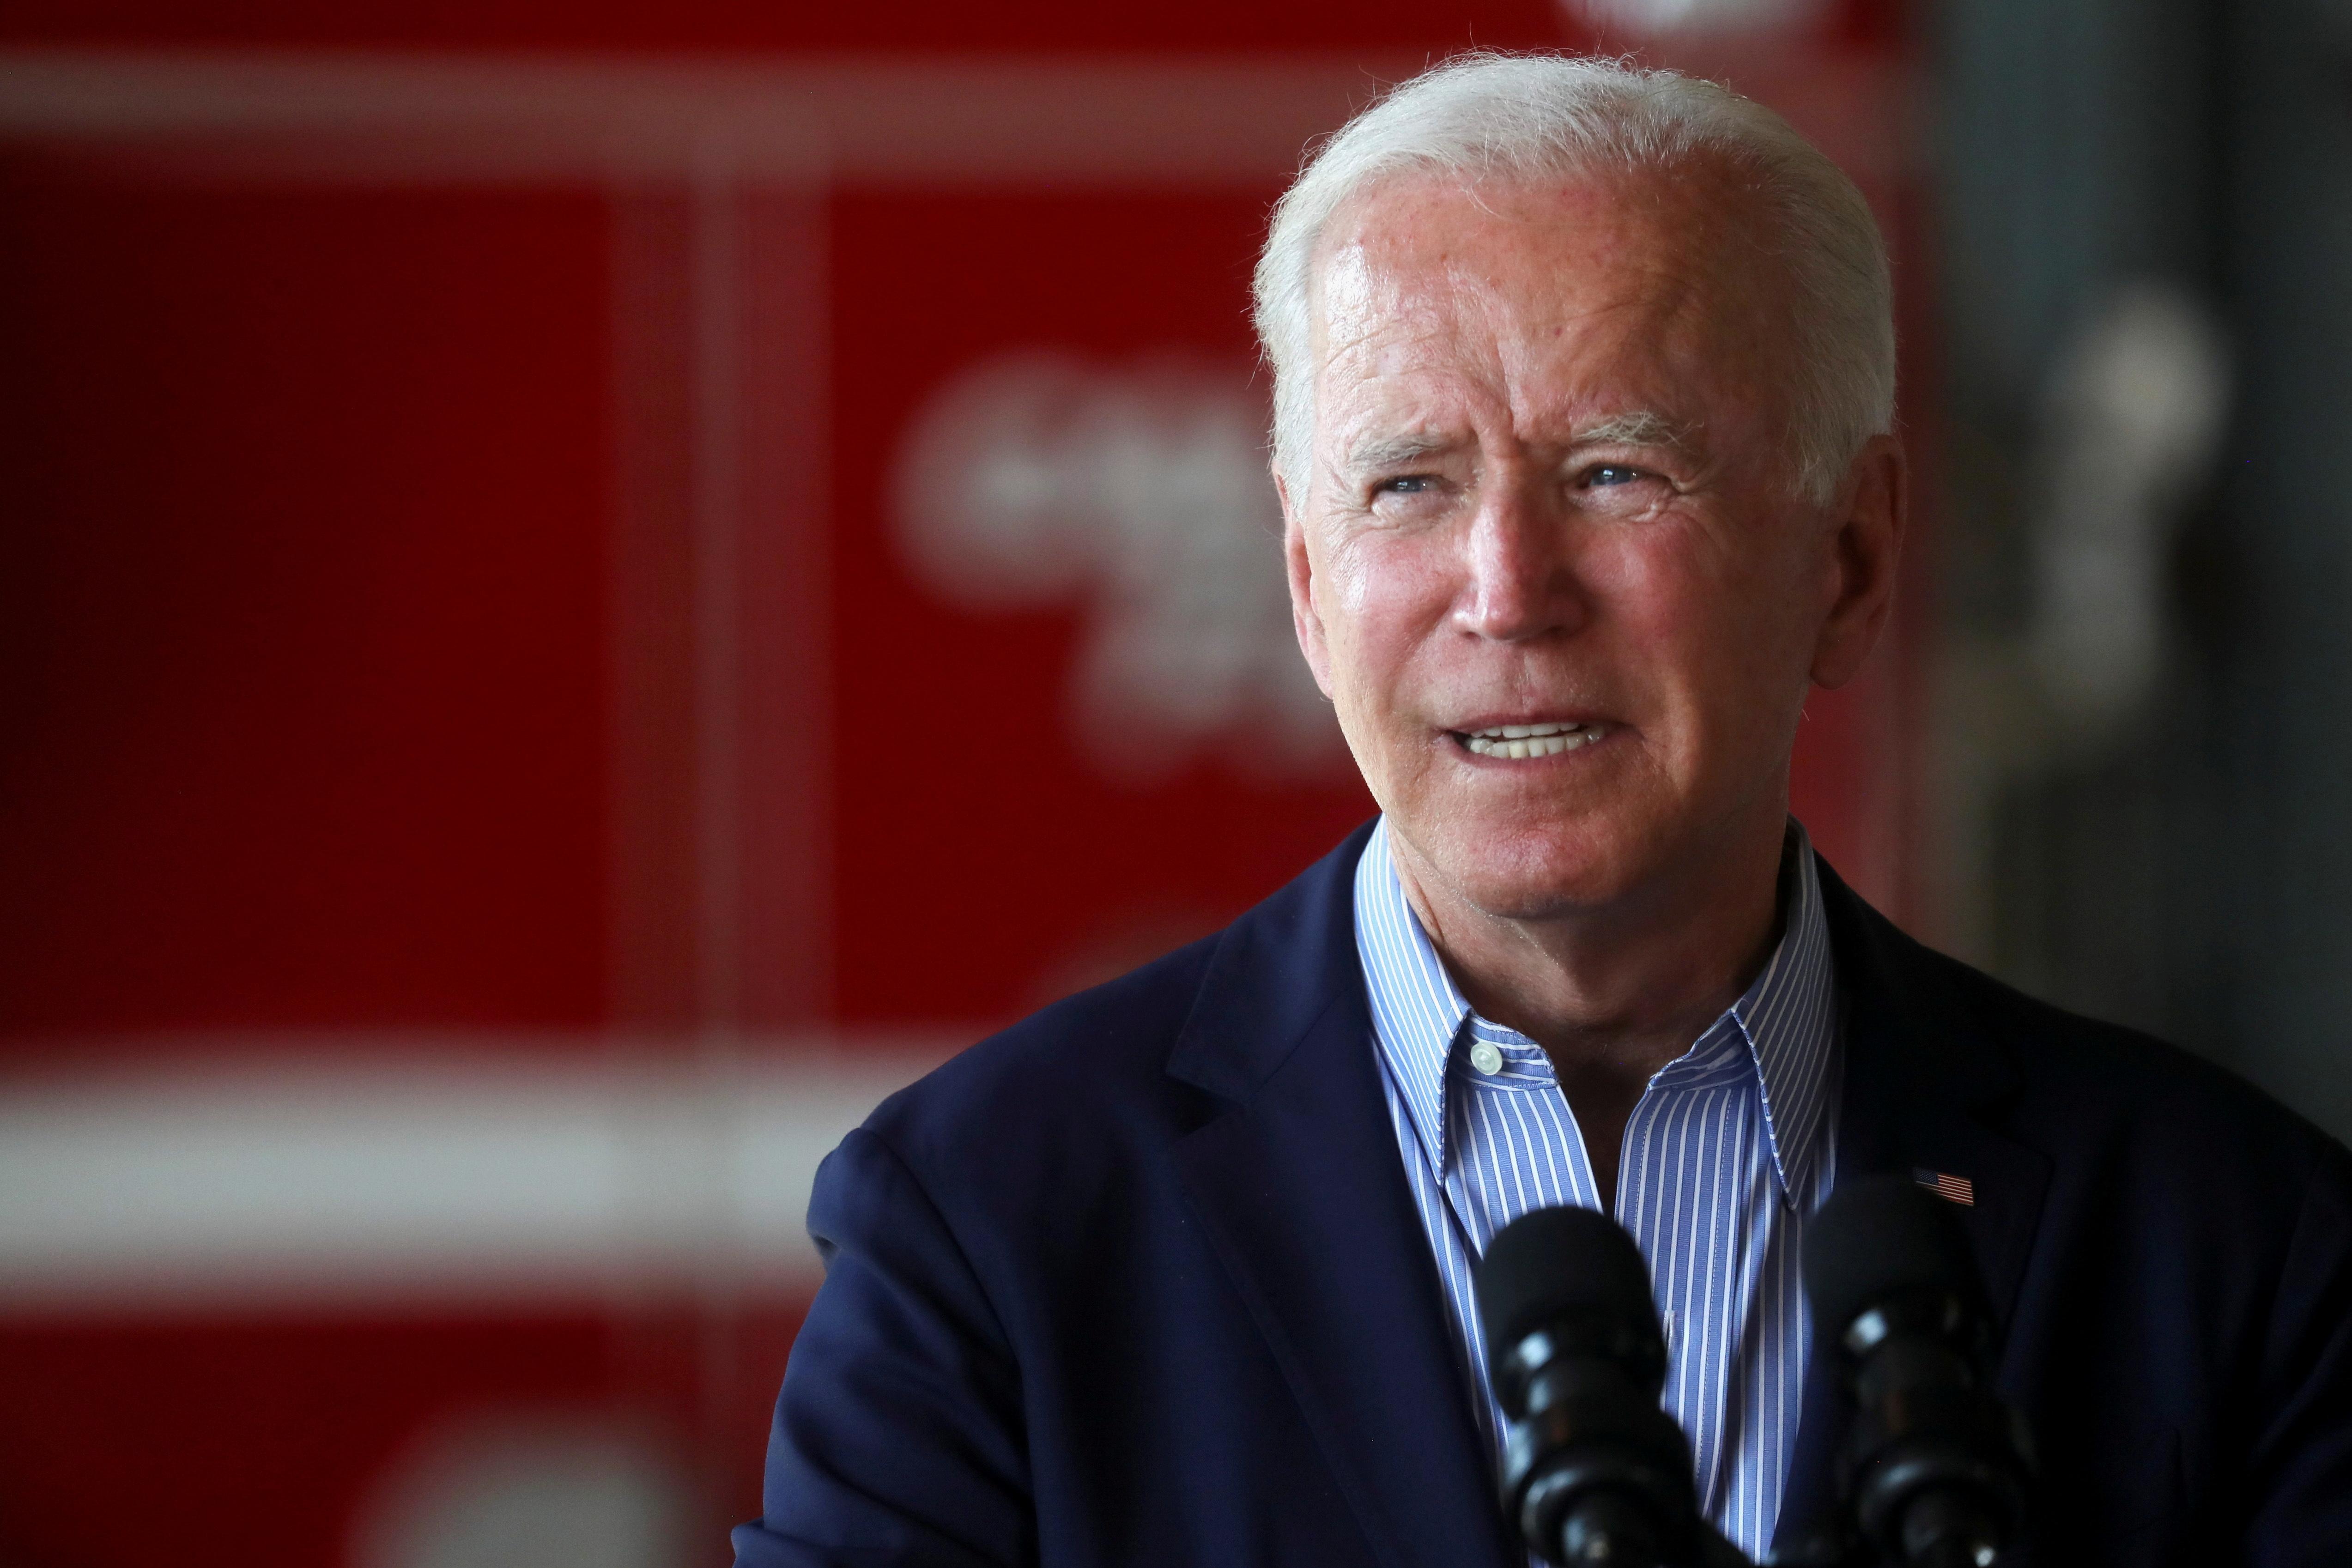 U.S. President Joe Biden gives remarks at Mather Airport, California, U.S., September 13, 2021. REUTERS/Leah Millis